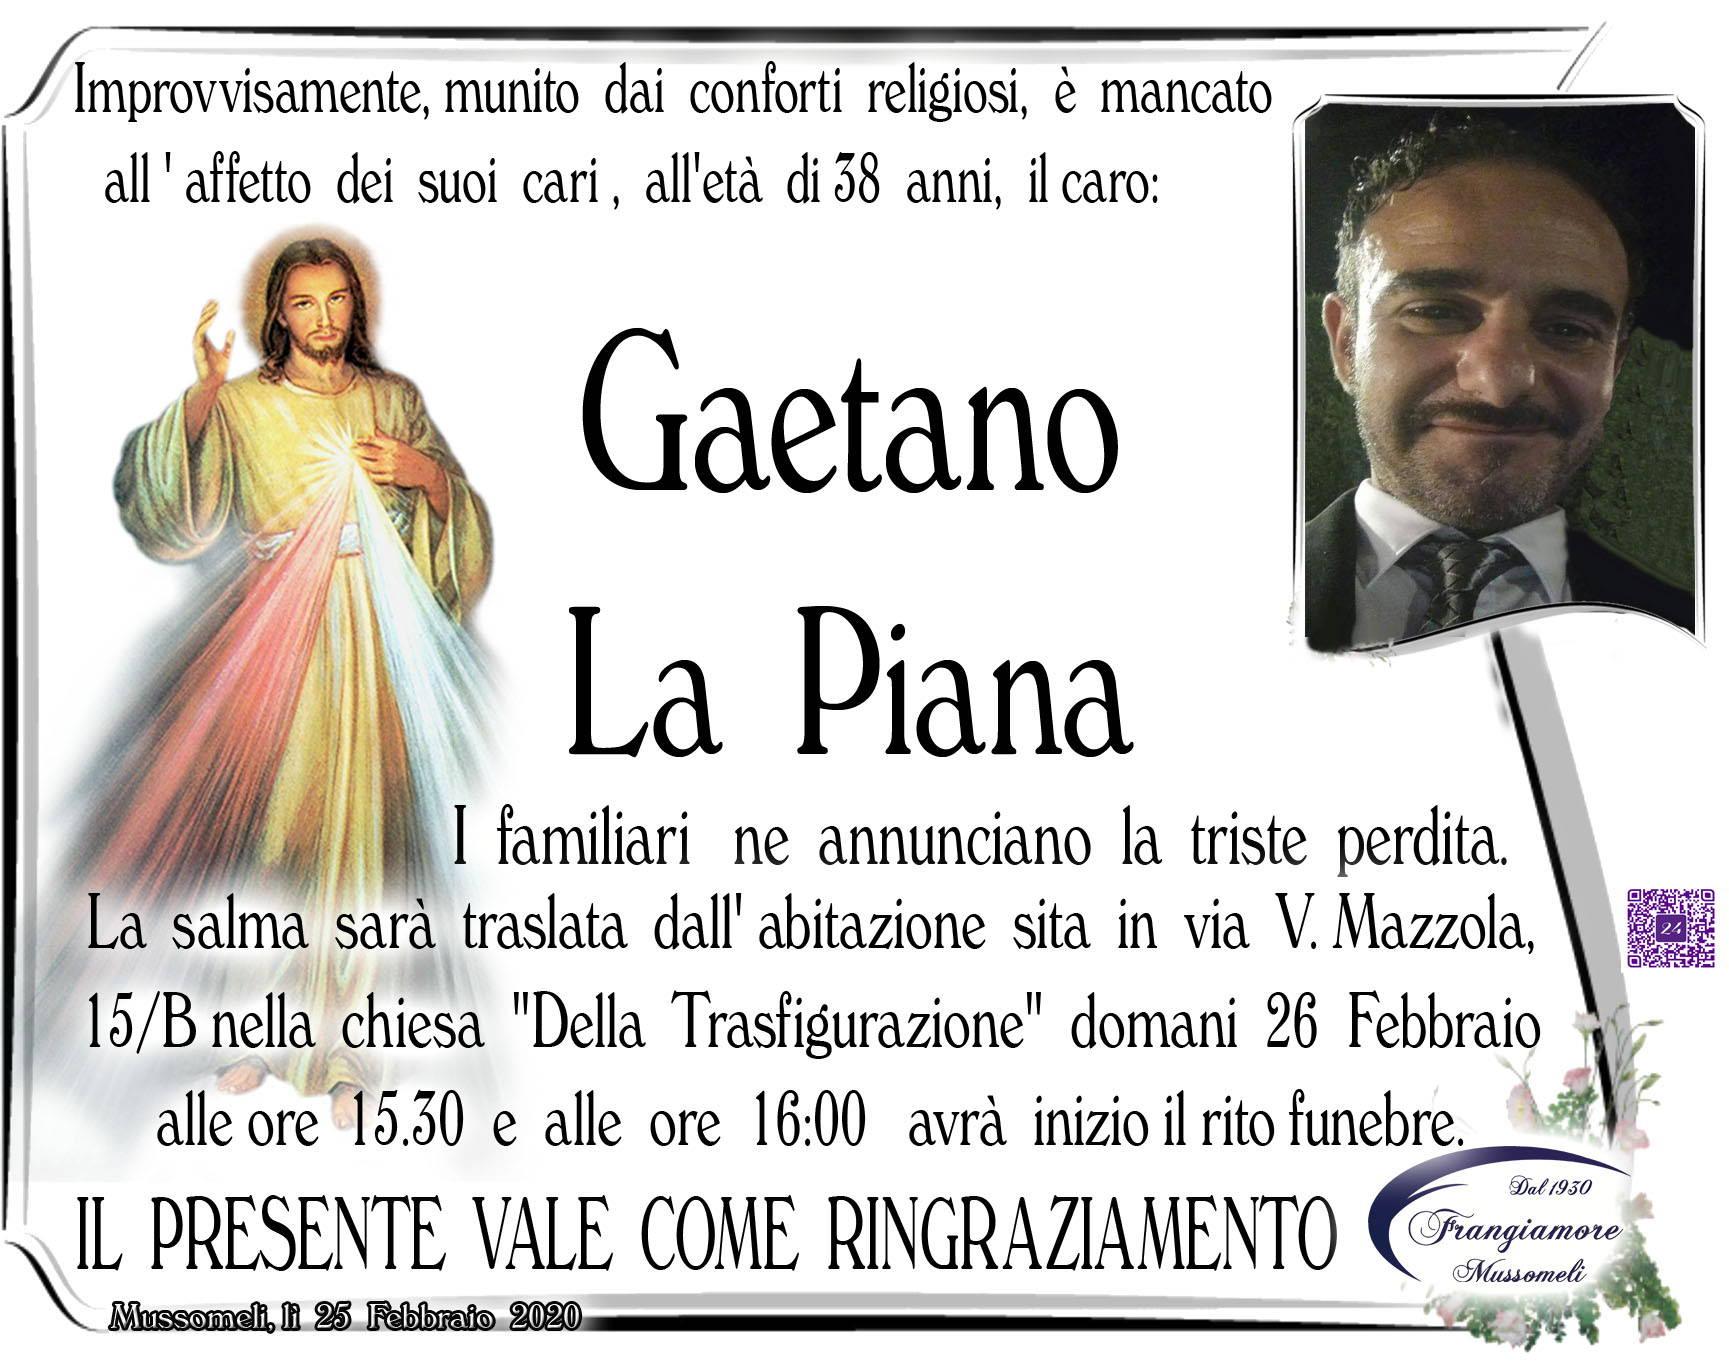 Gaetano La Piana